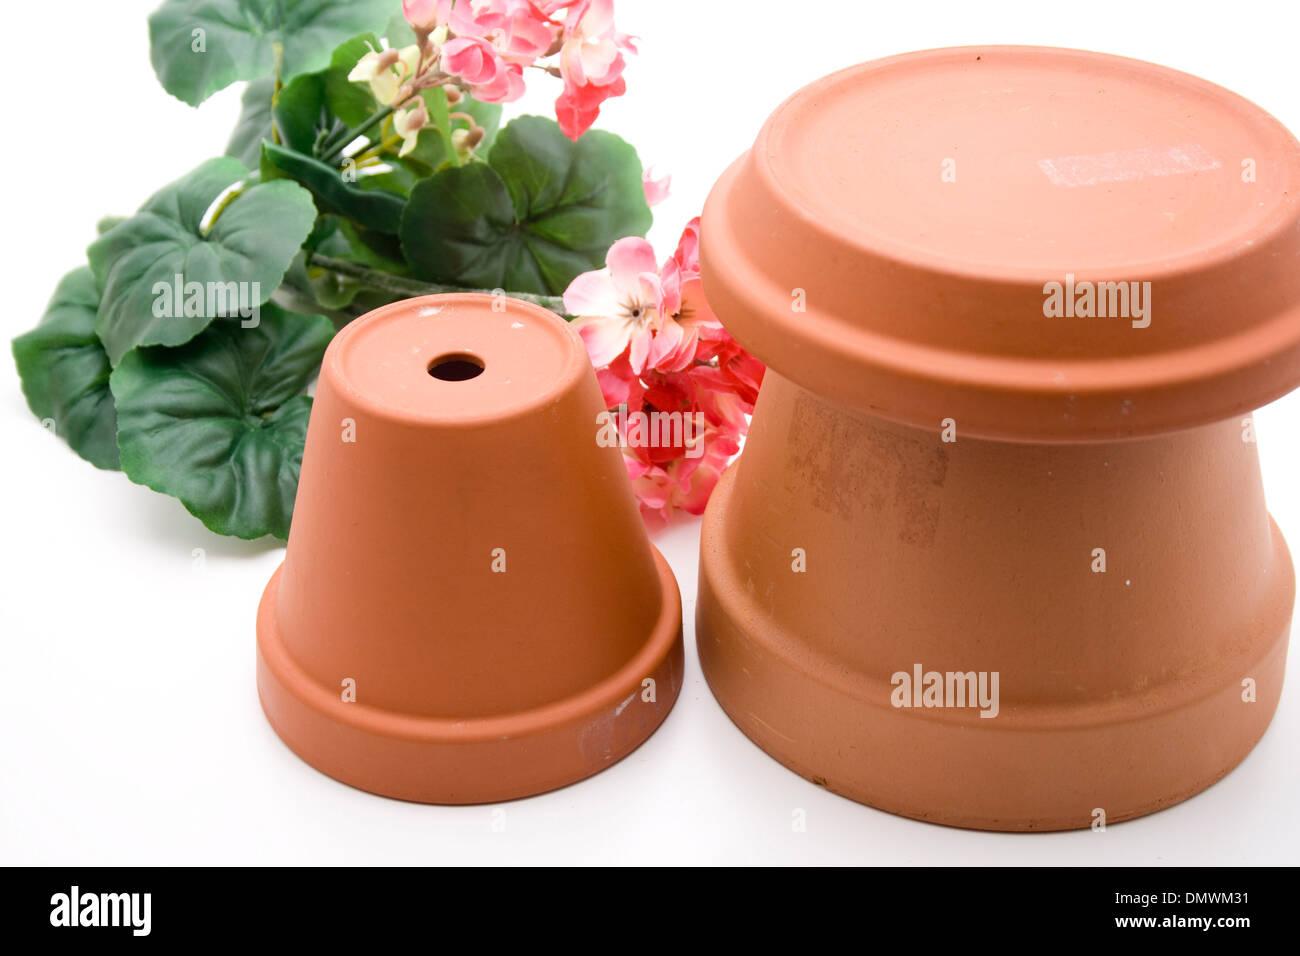 Plant pot with geranium - Stock Image